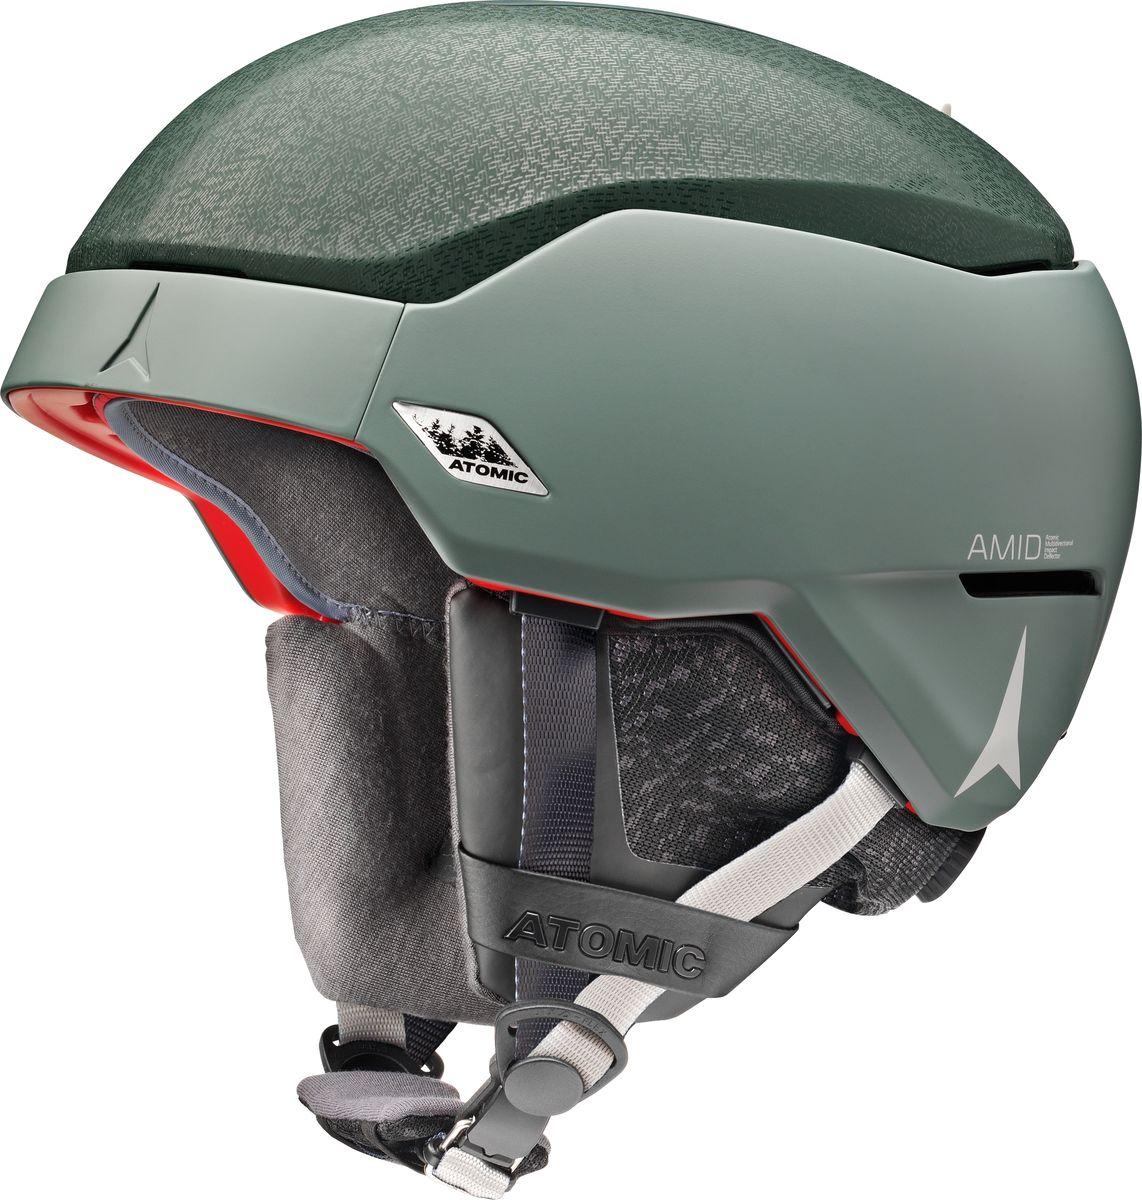 Шлем горнолыжный Atomic Count Amid, цвет: зеленый. Размер L (59-62)